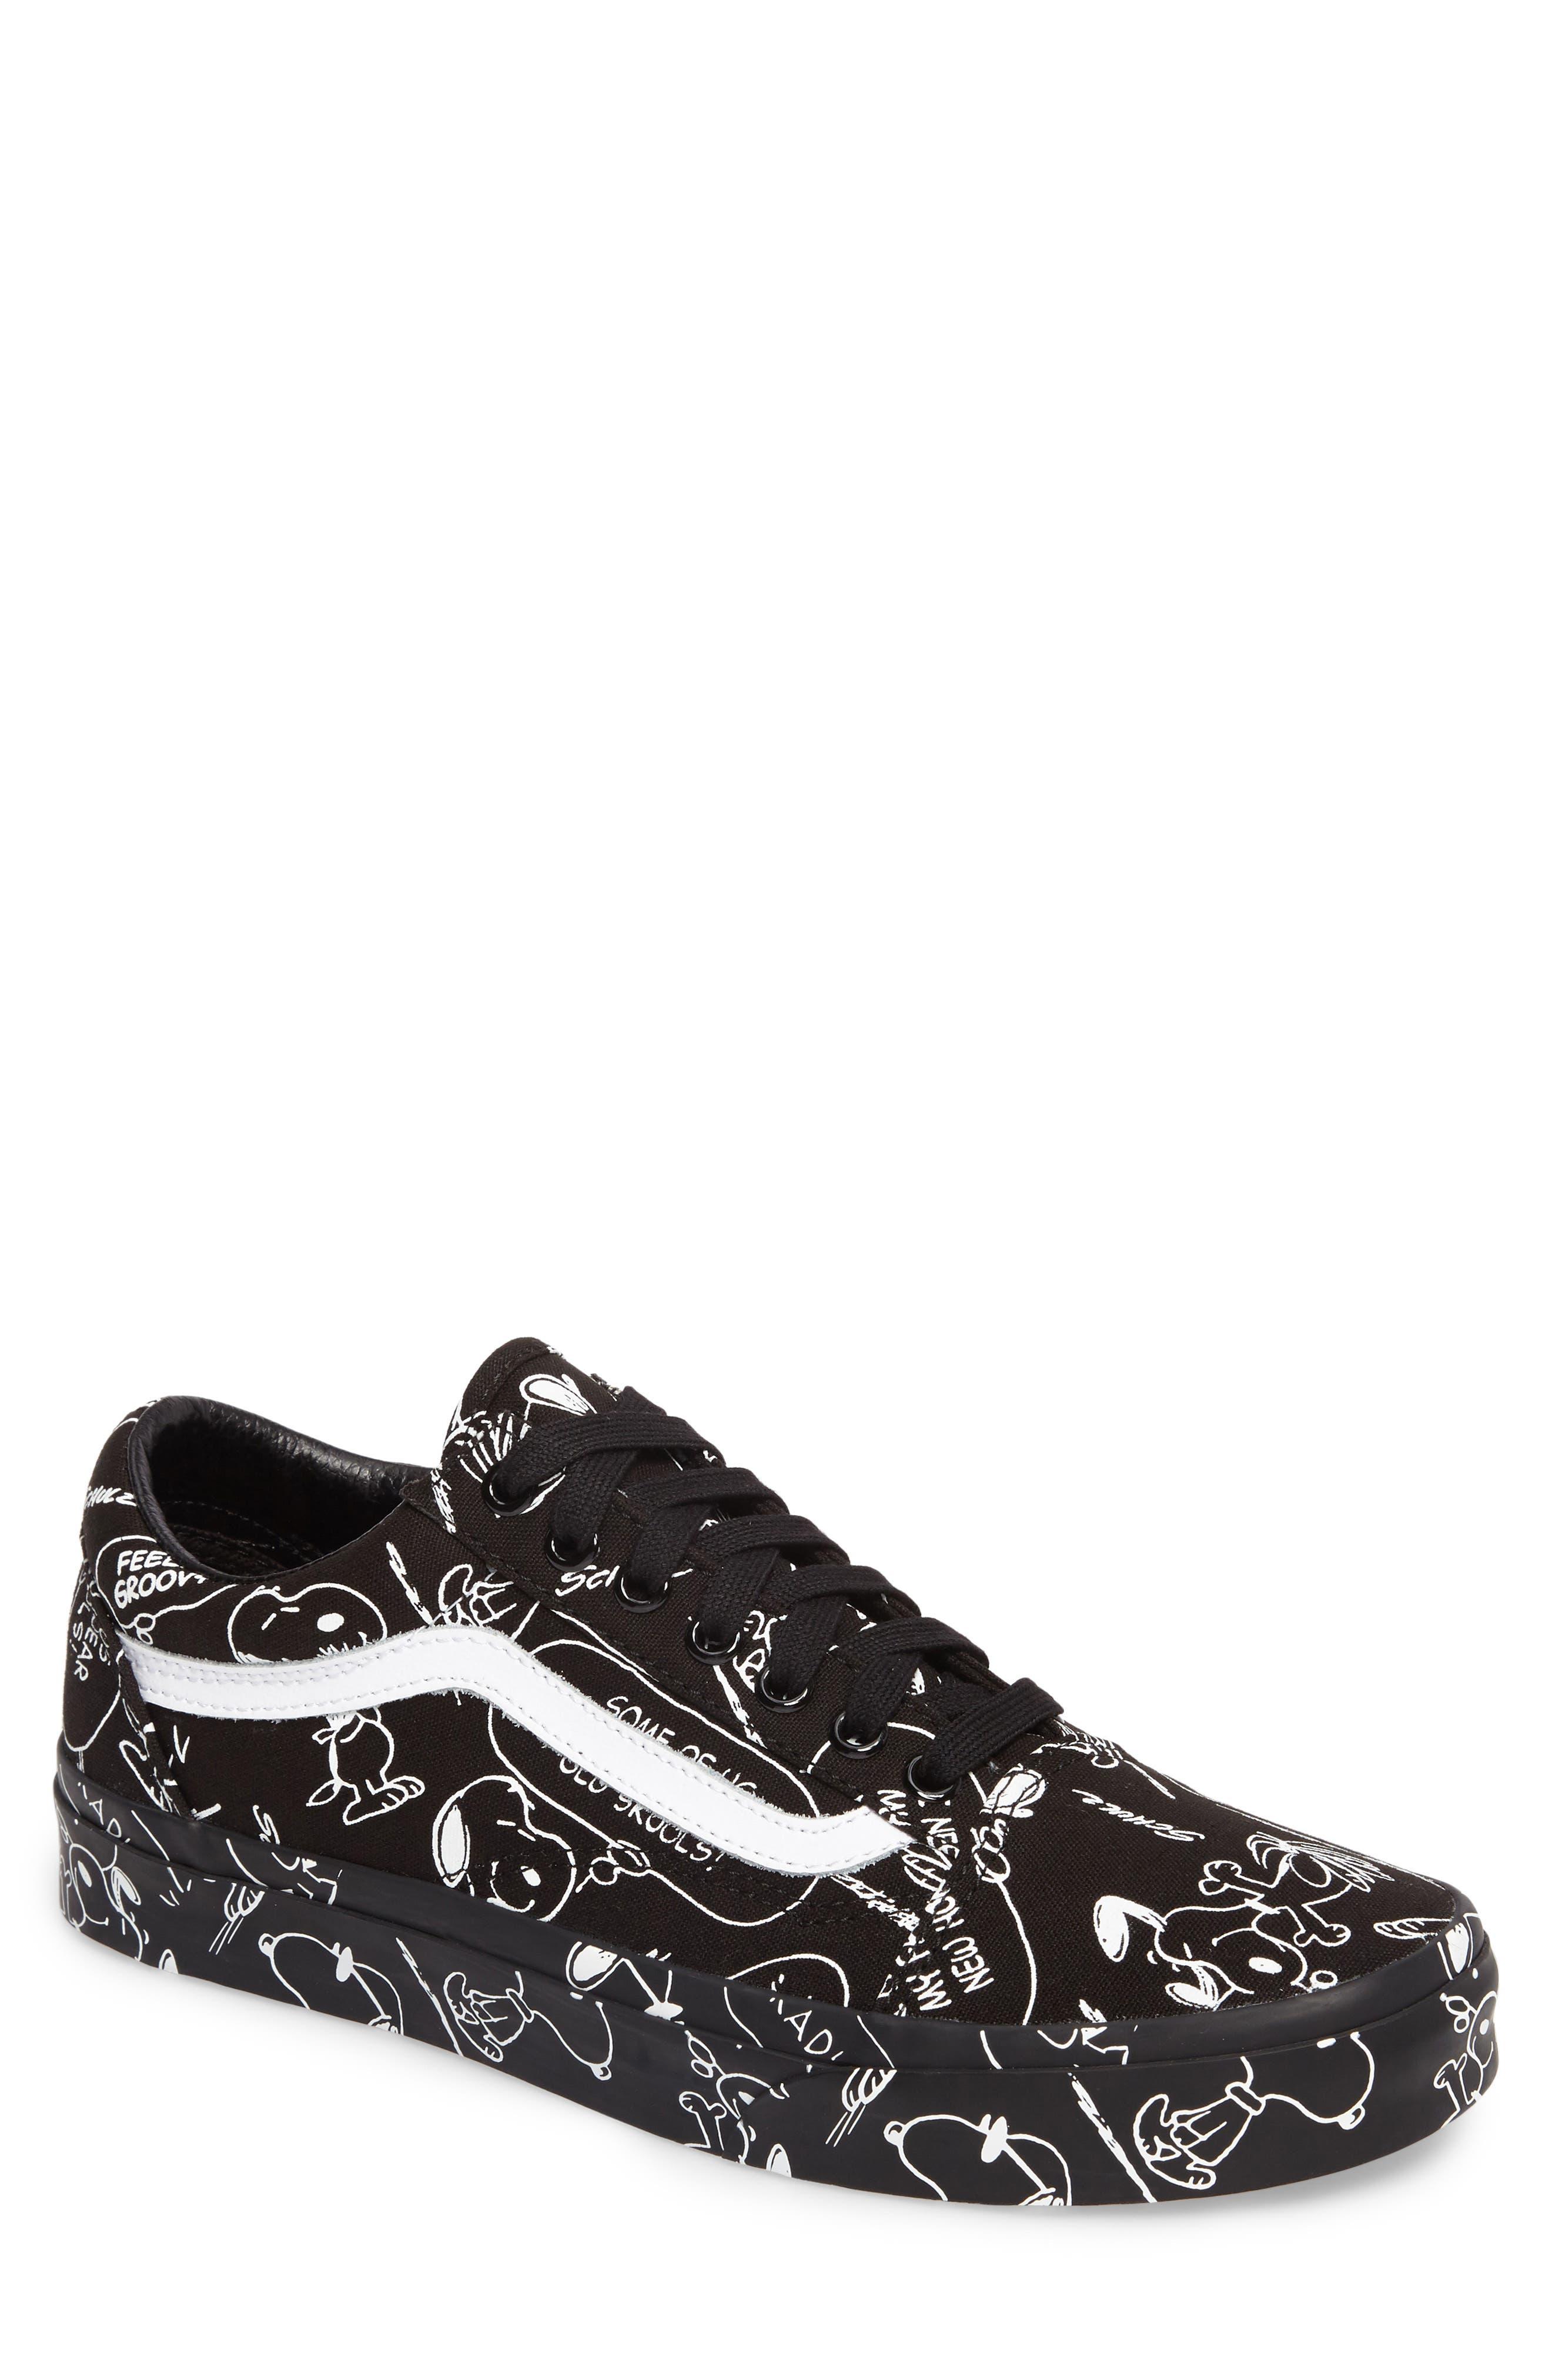 x Peanuts<sup>®</sup> Old Skool Sneaker,                             Main thumbnail 1, color,                             Black Canvas